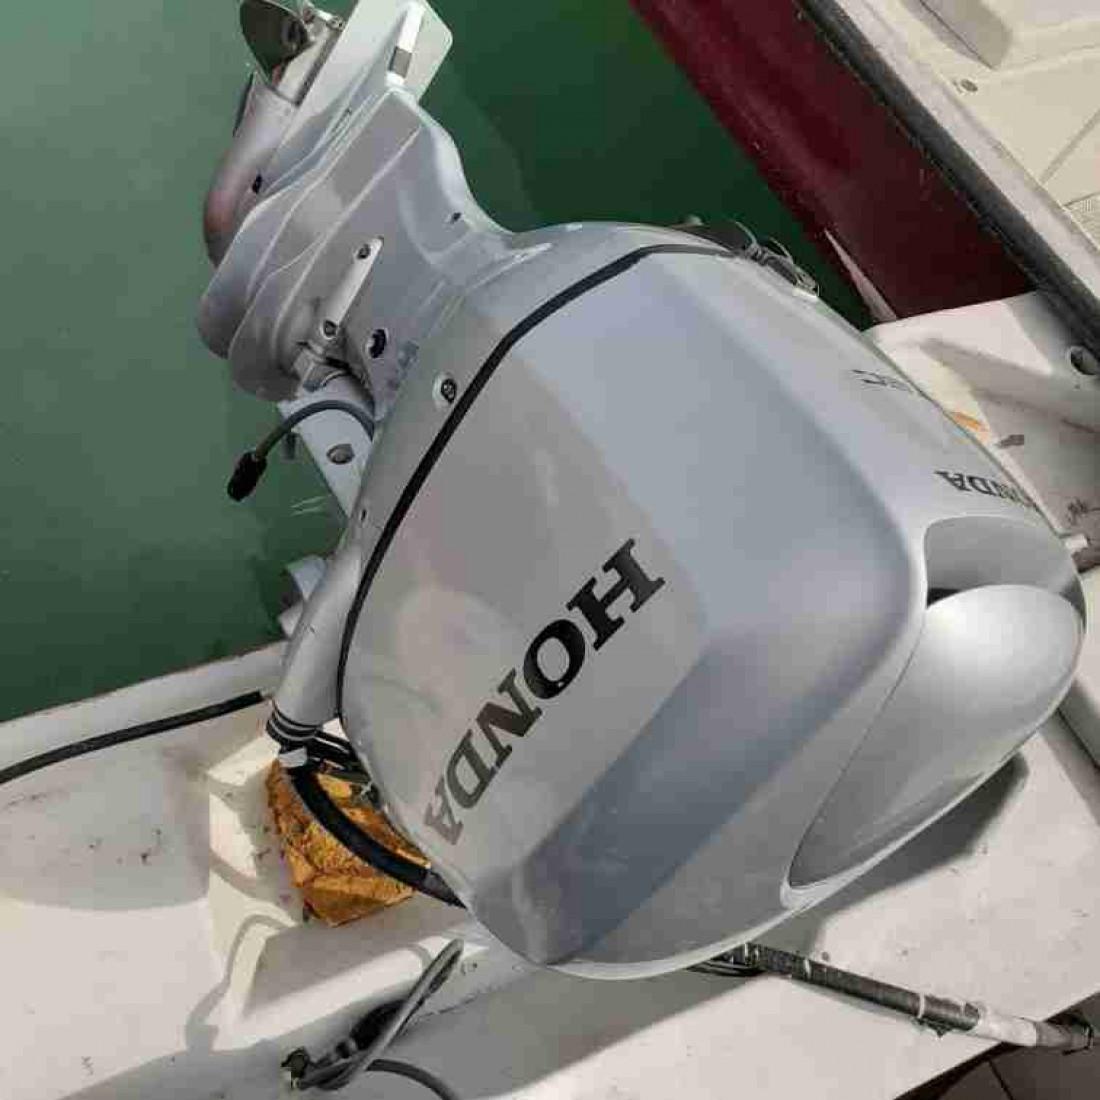 فروش موتور هوندا 115